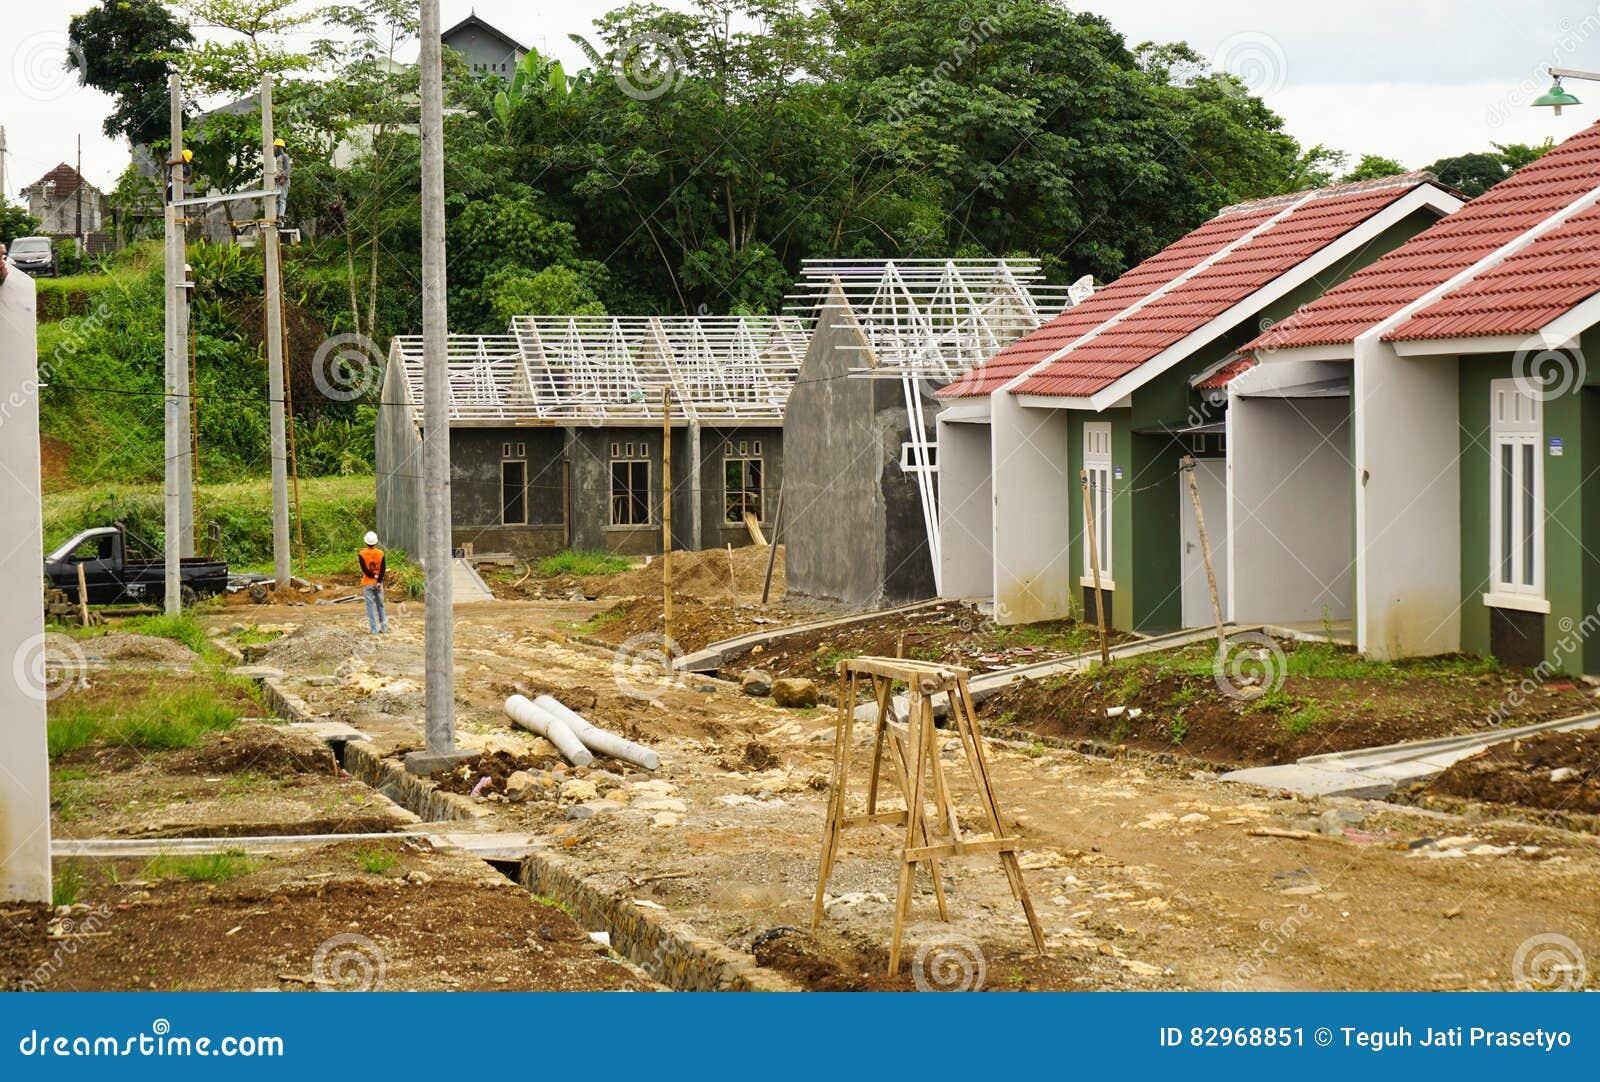 Intermediate Real Estate Project Photo Taken In Bogor